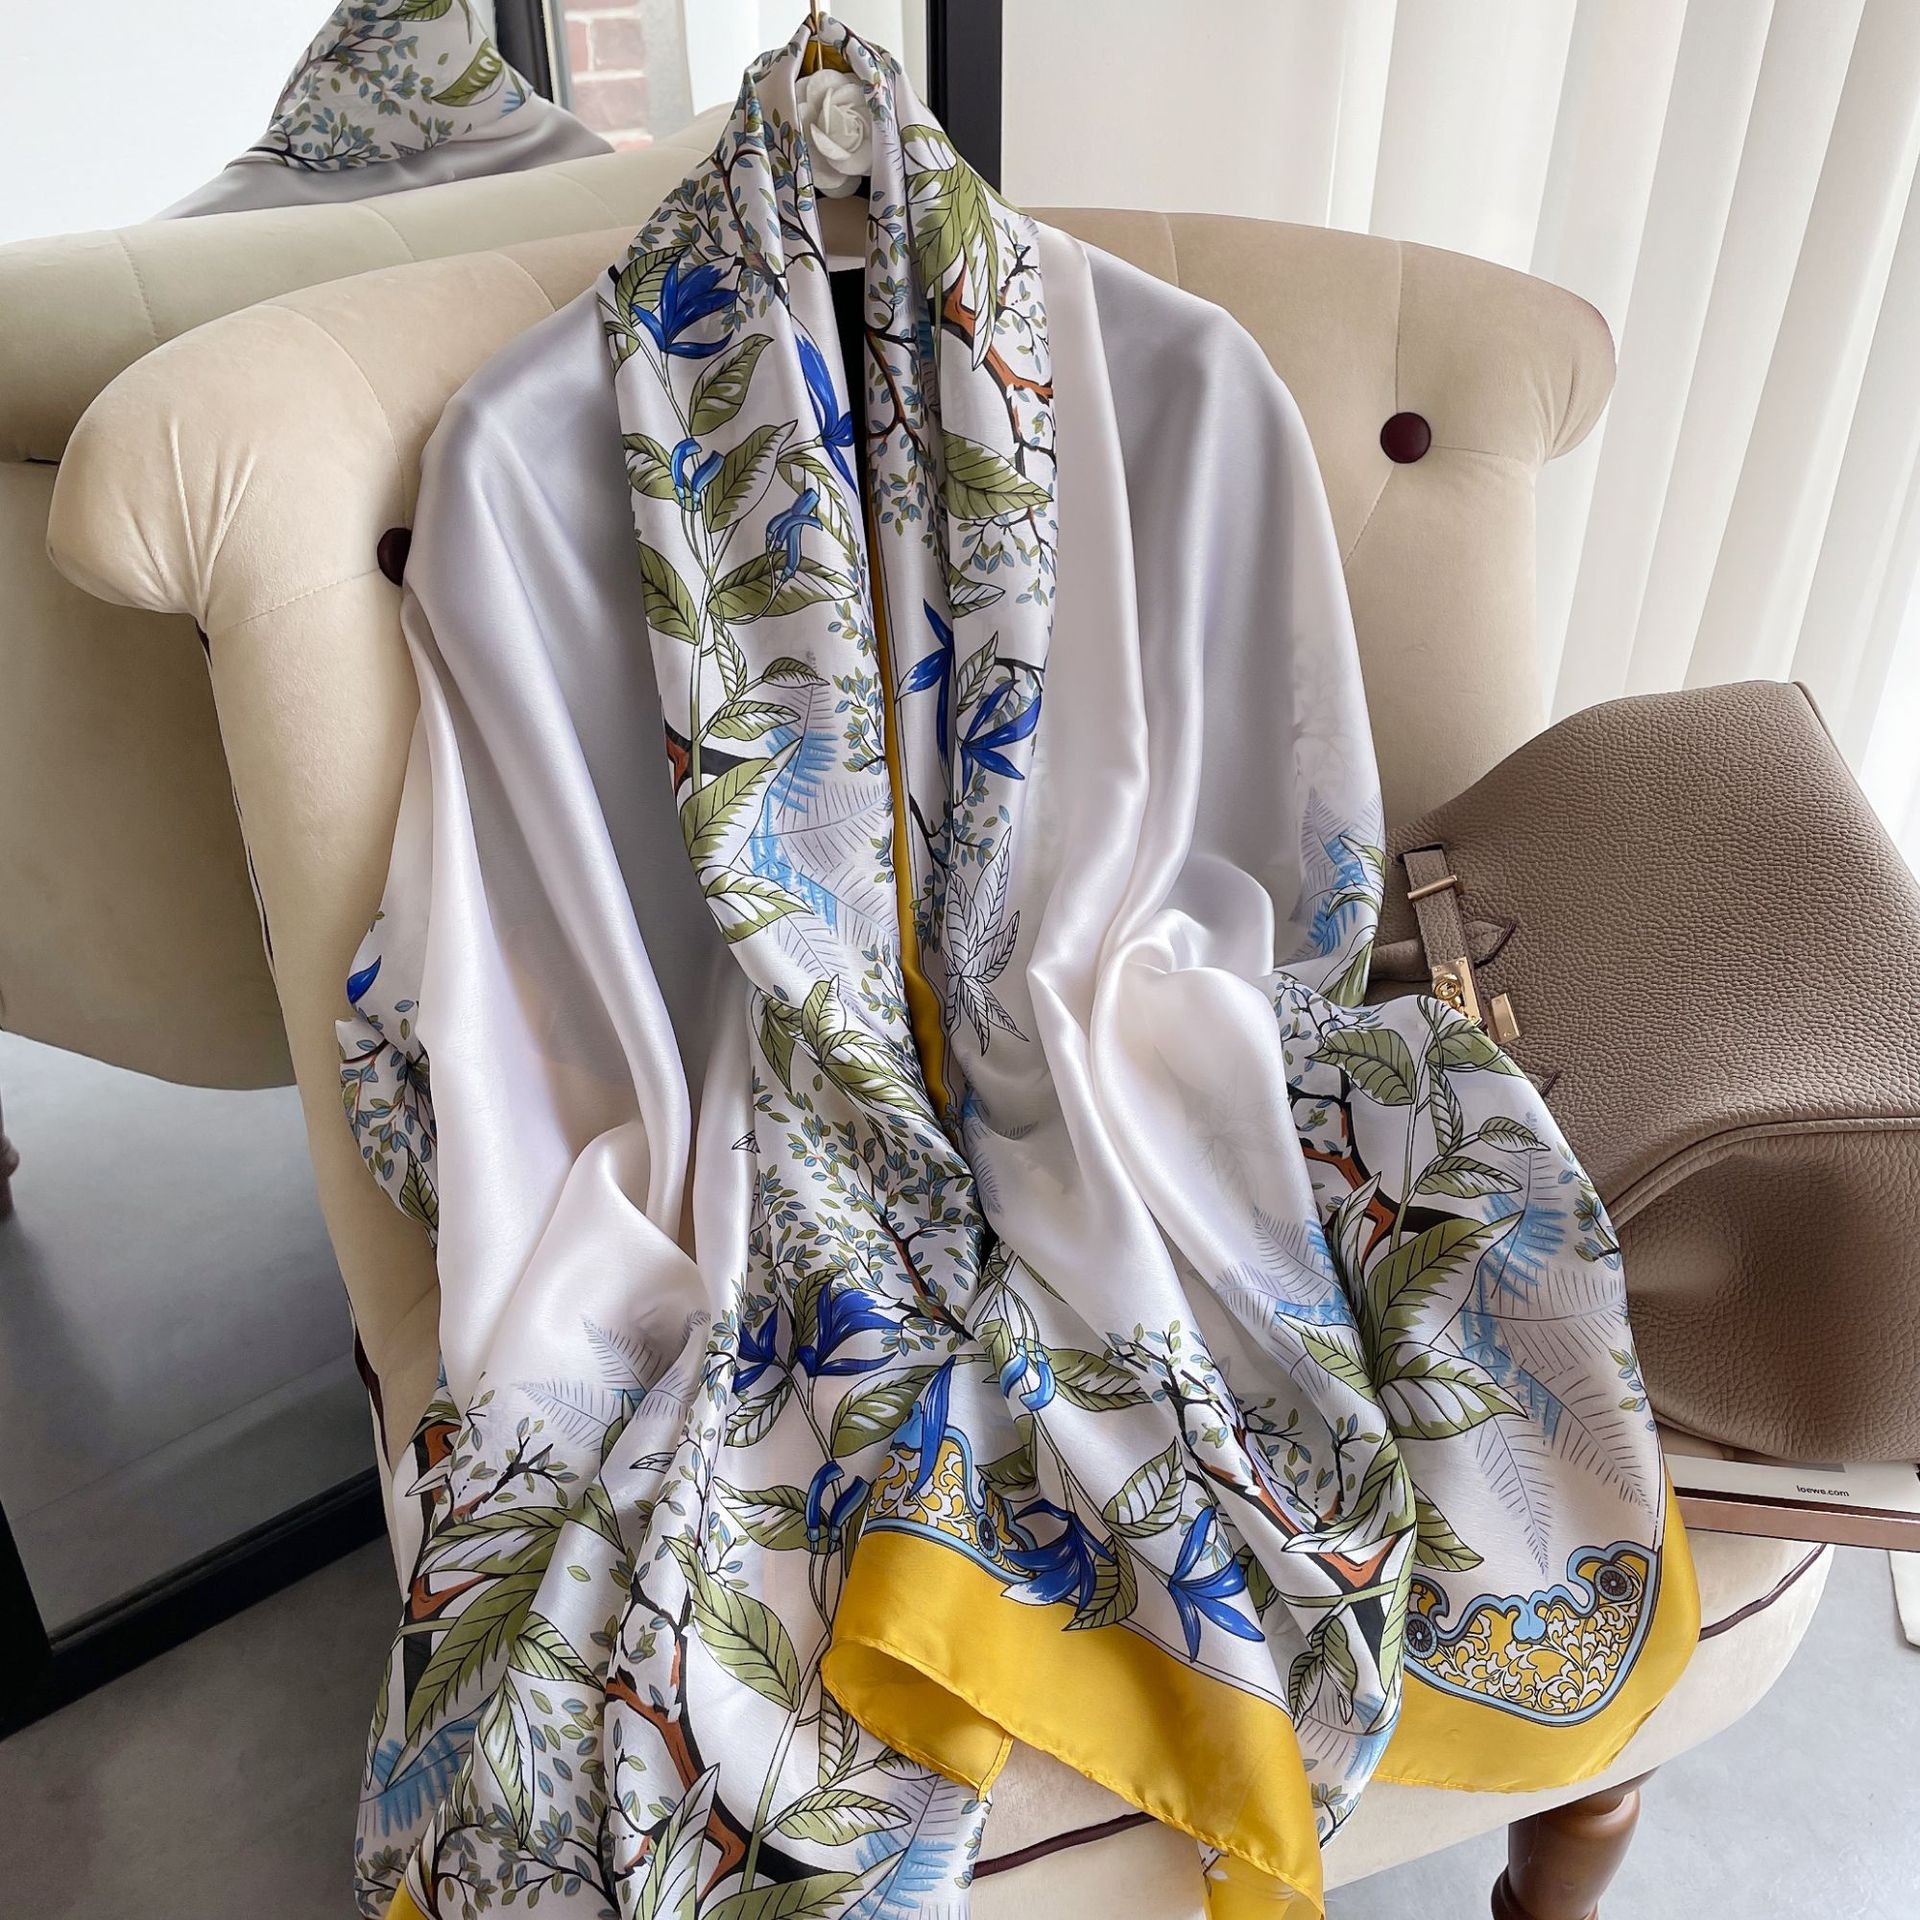 2021 Spring and Summer New Ladies Silk Scarf Simulation Silk Scarf Long Wild Sunscreen Shawl Beach Towel 180-90cm недорого